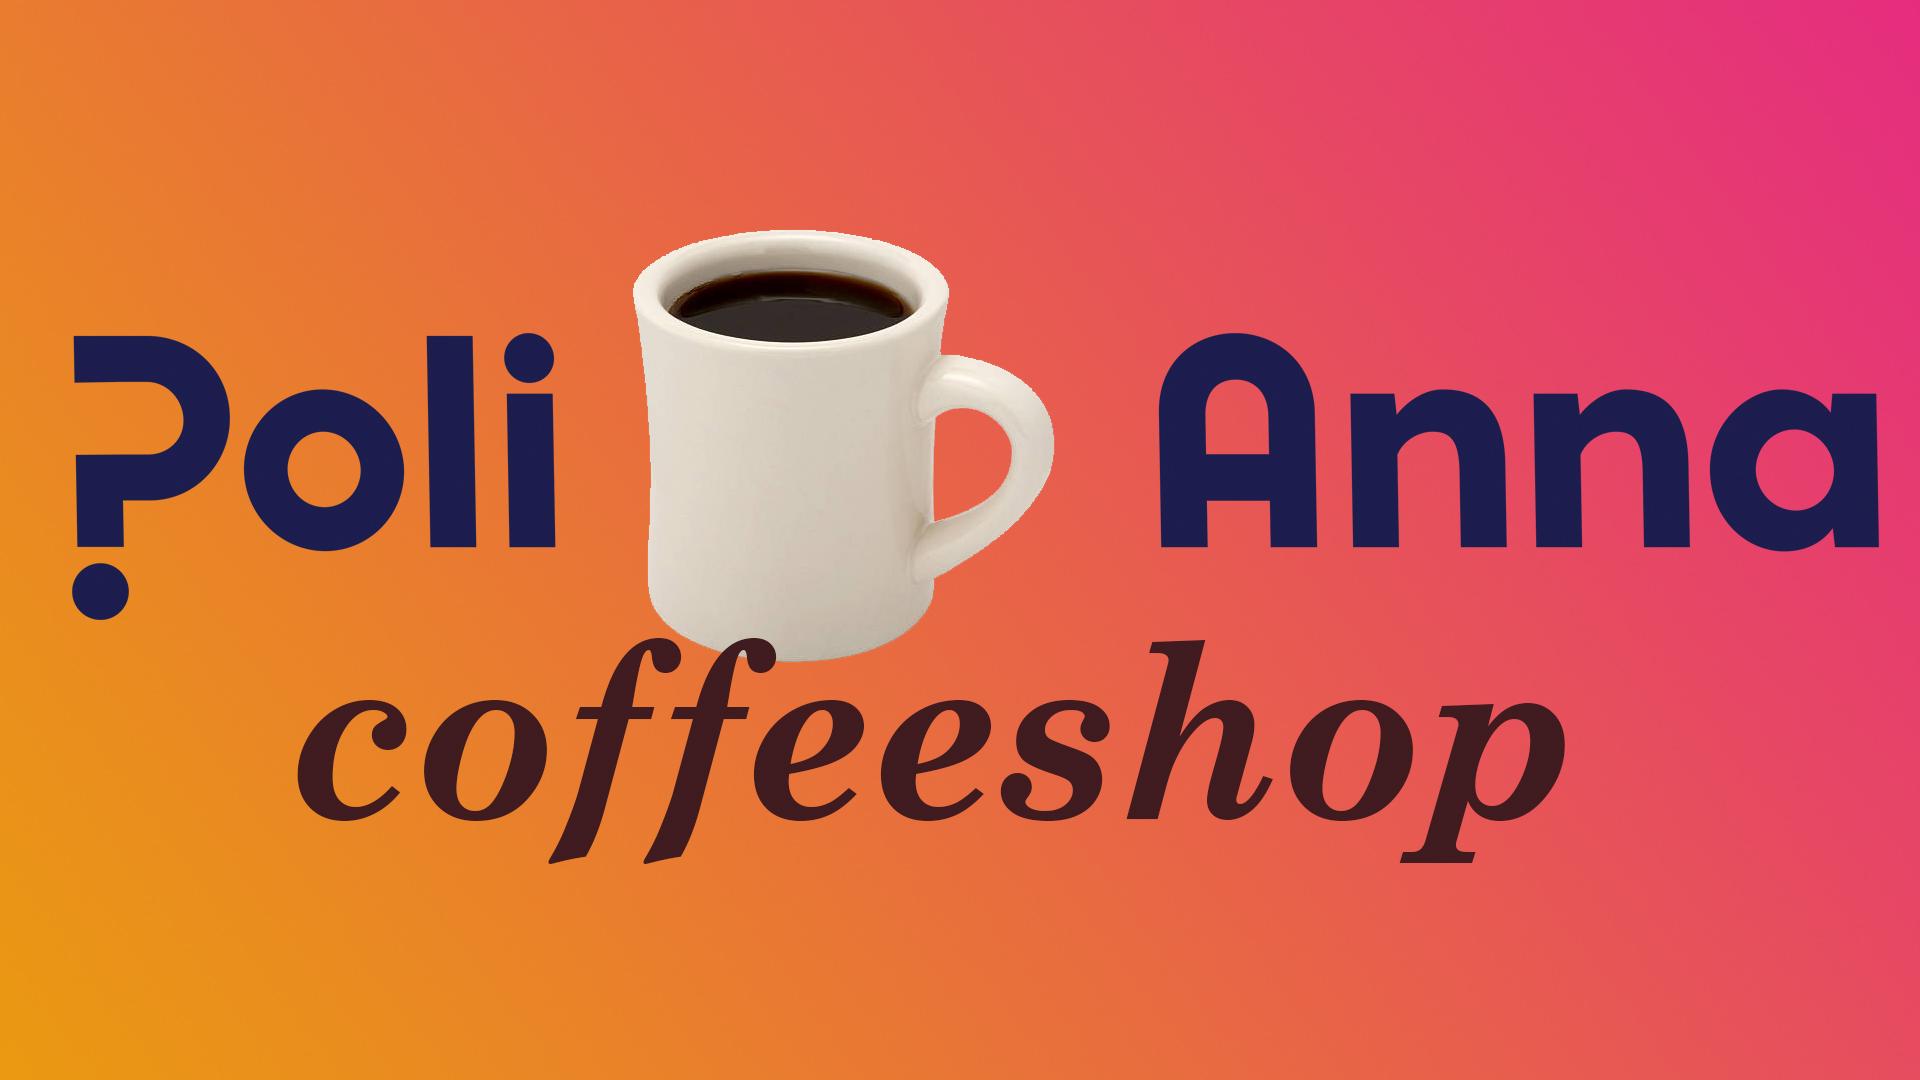 pa-coffeeshop.jpg